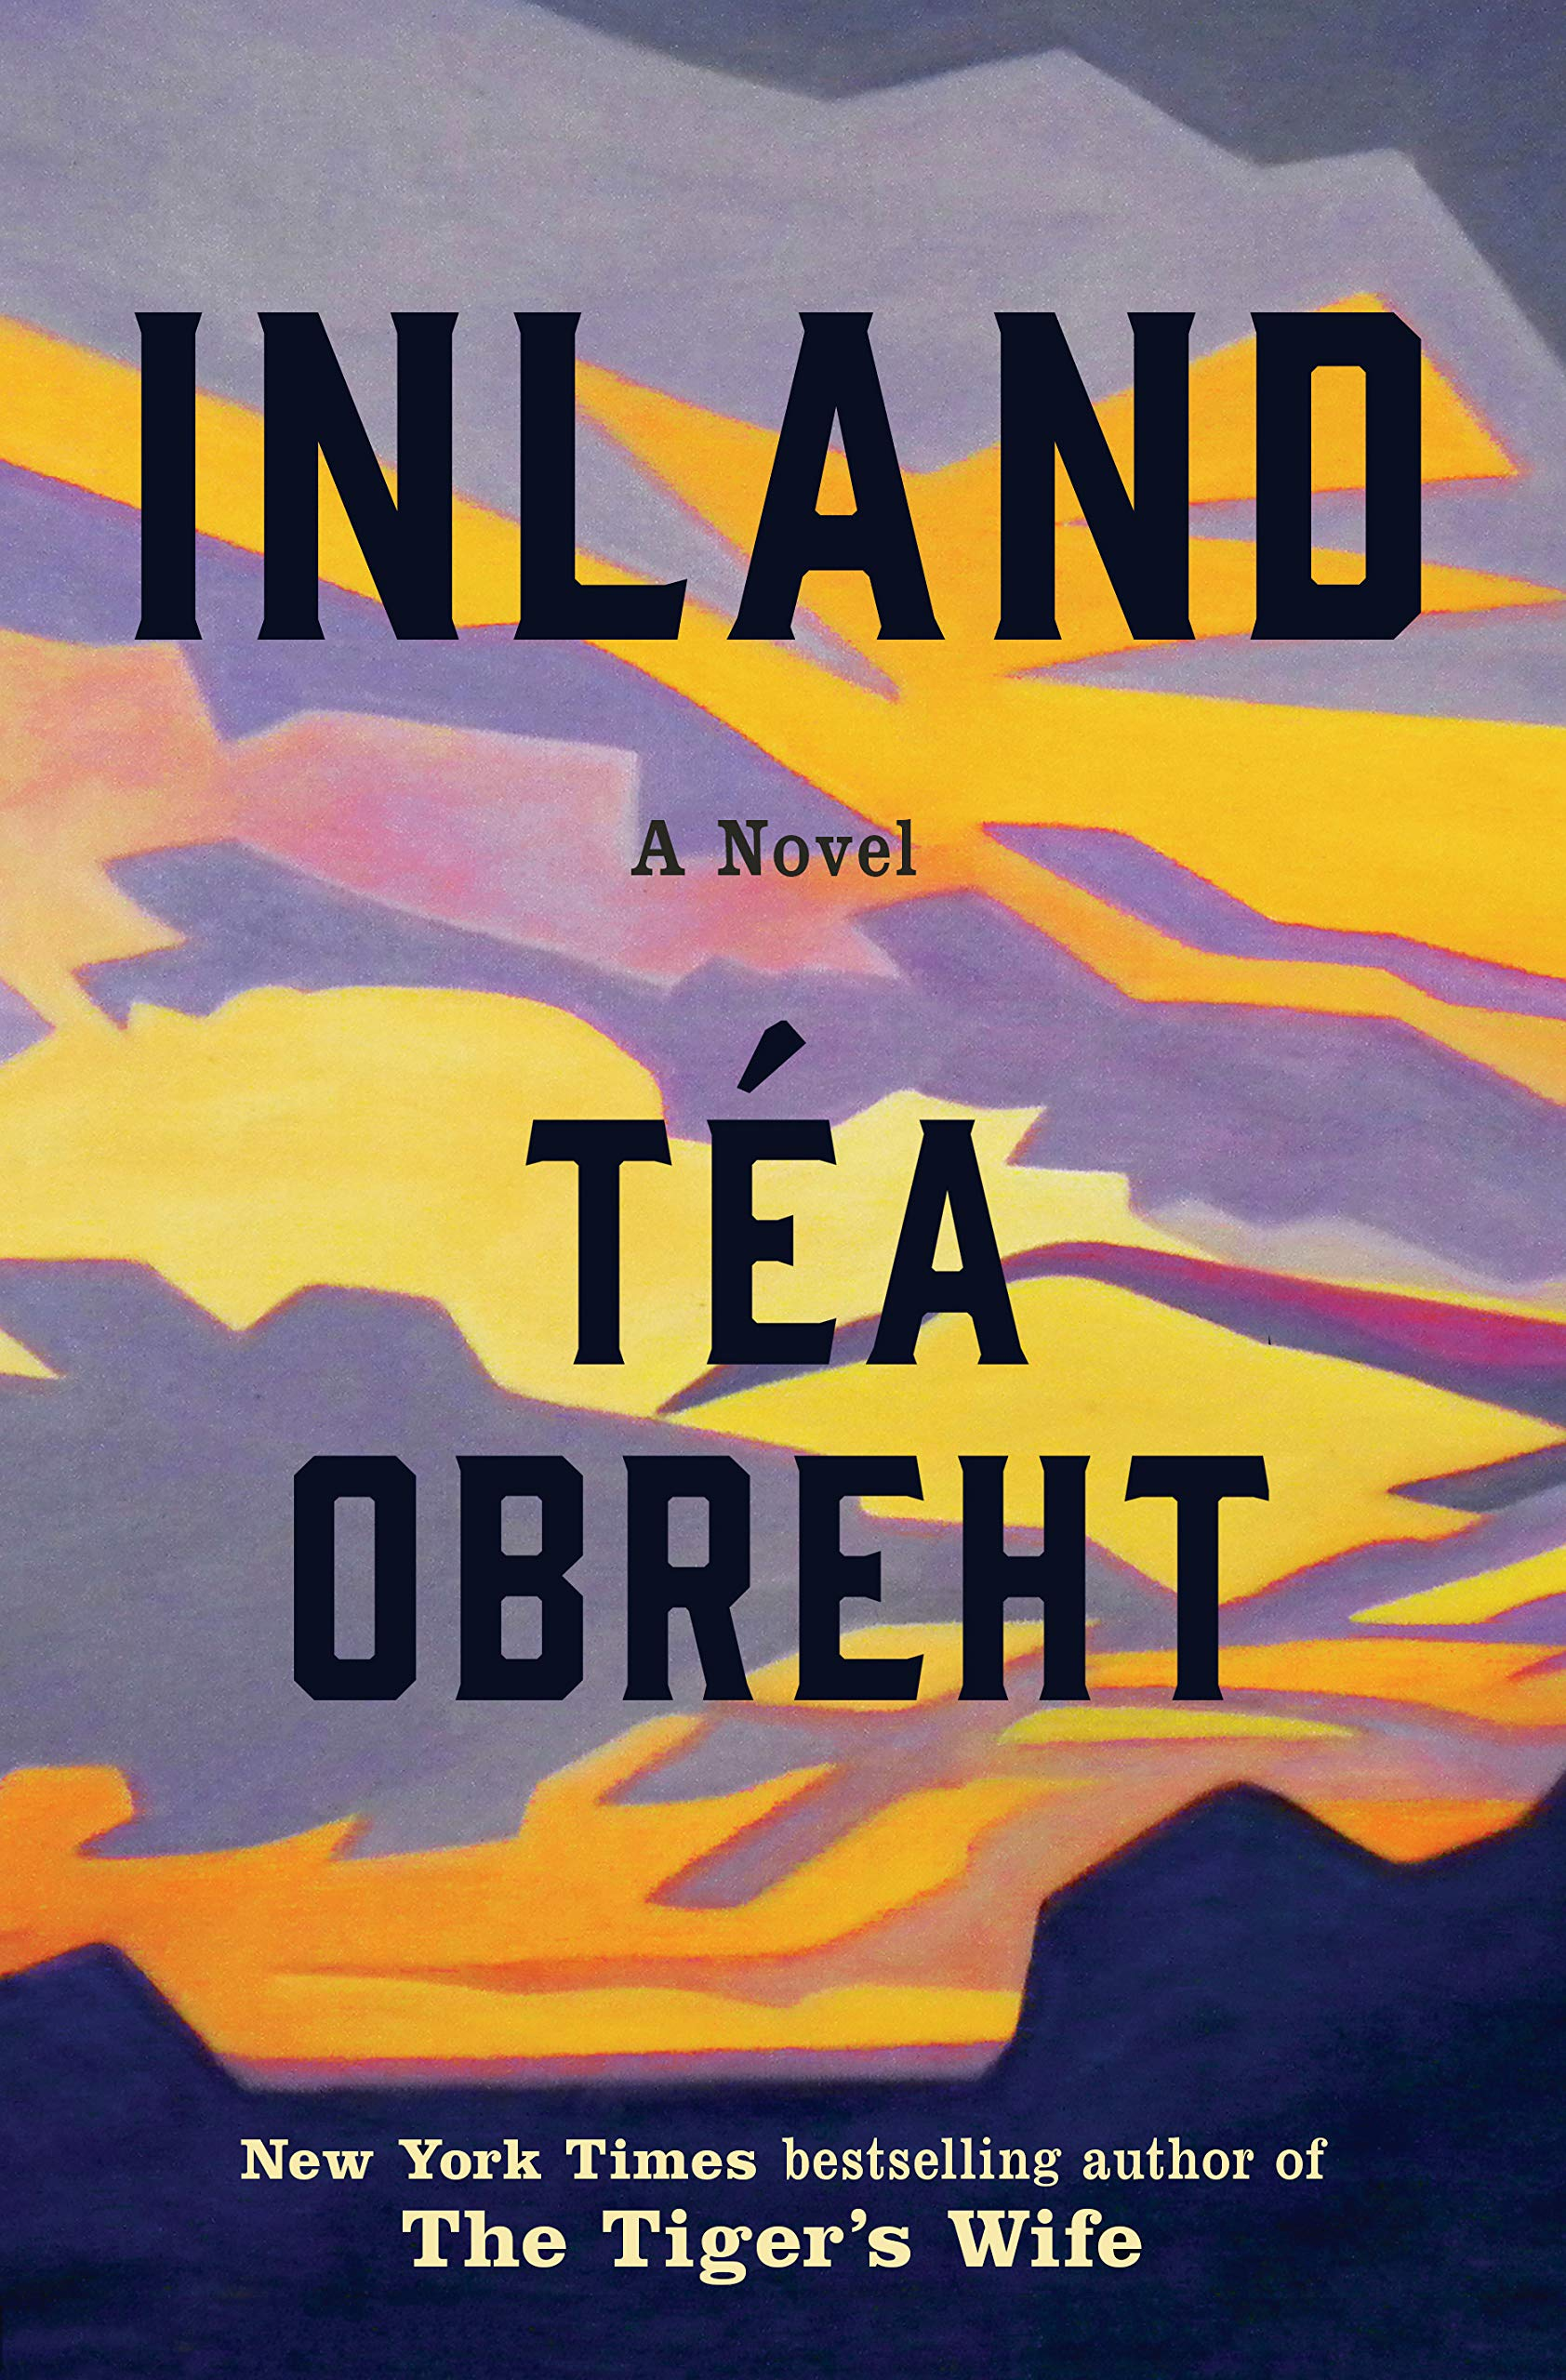 Inland: Amazon.es: Obreht, Tea, Obreht, Tea: Libros en idiomas ...